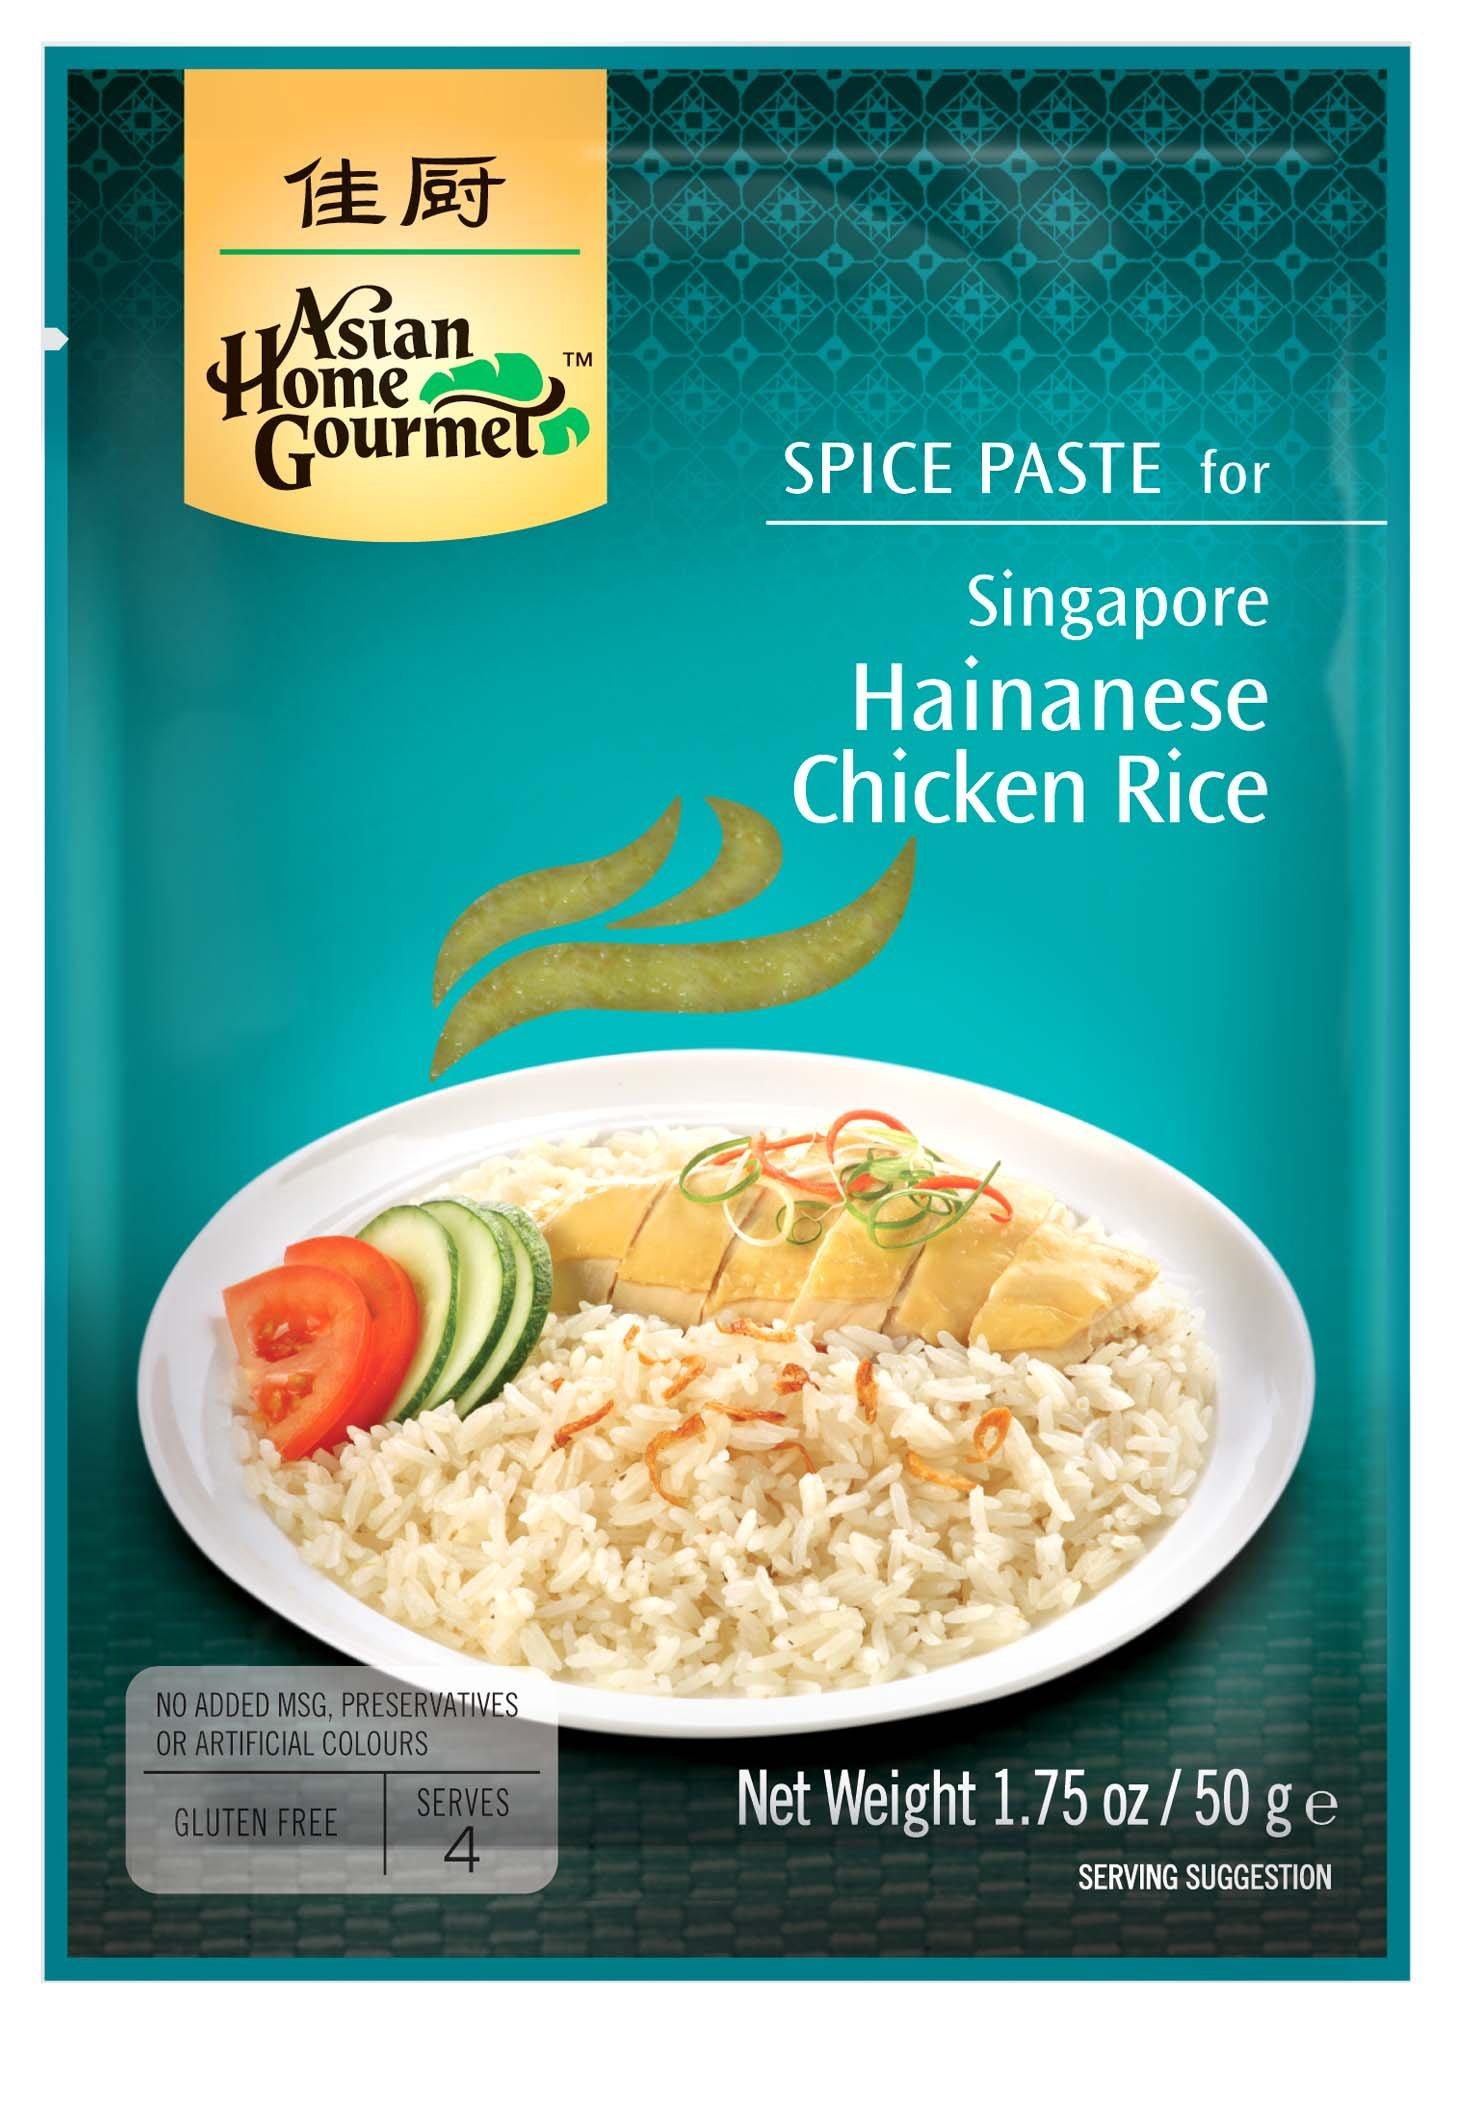 Amazon.com : Asian Home Gourmet Spice Paste for SINGAPORE LAKSA ...